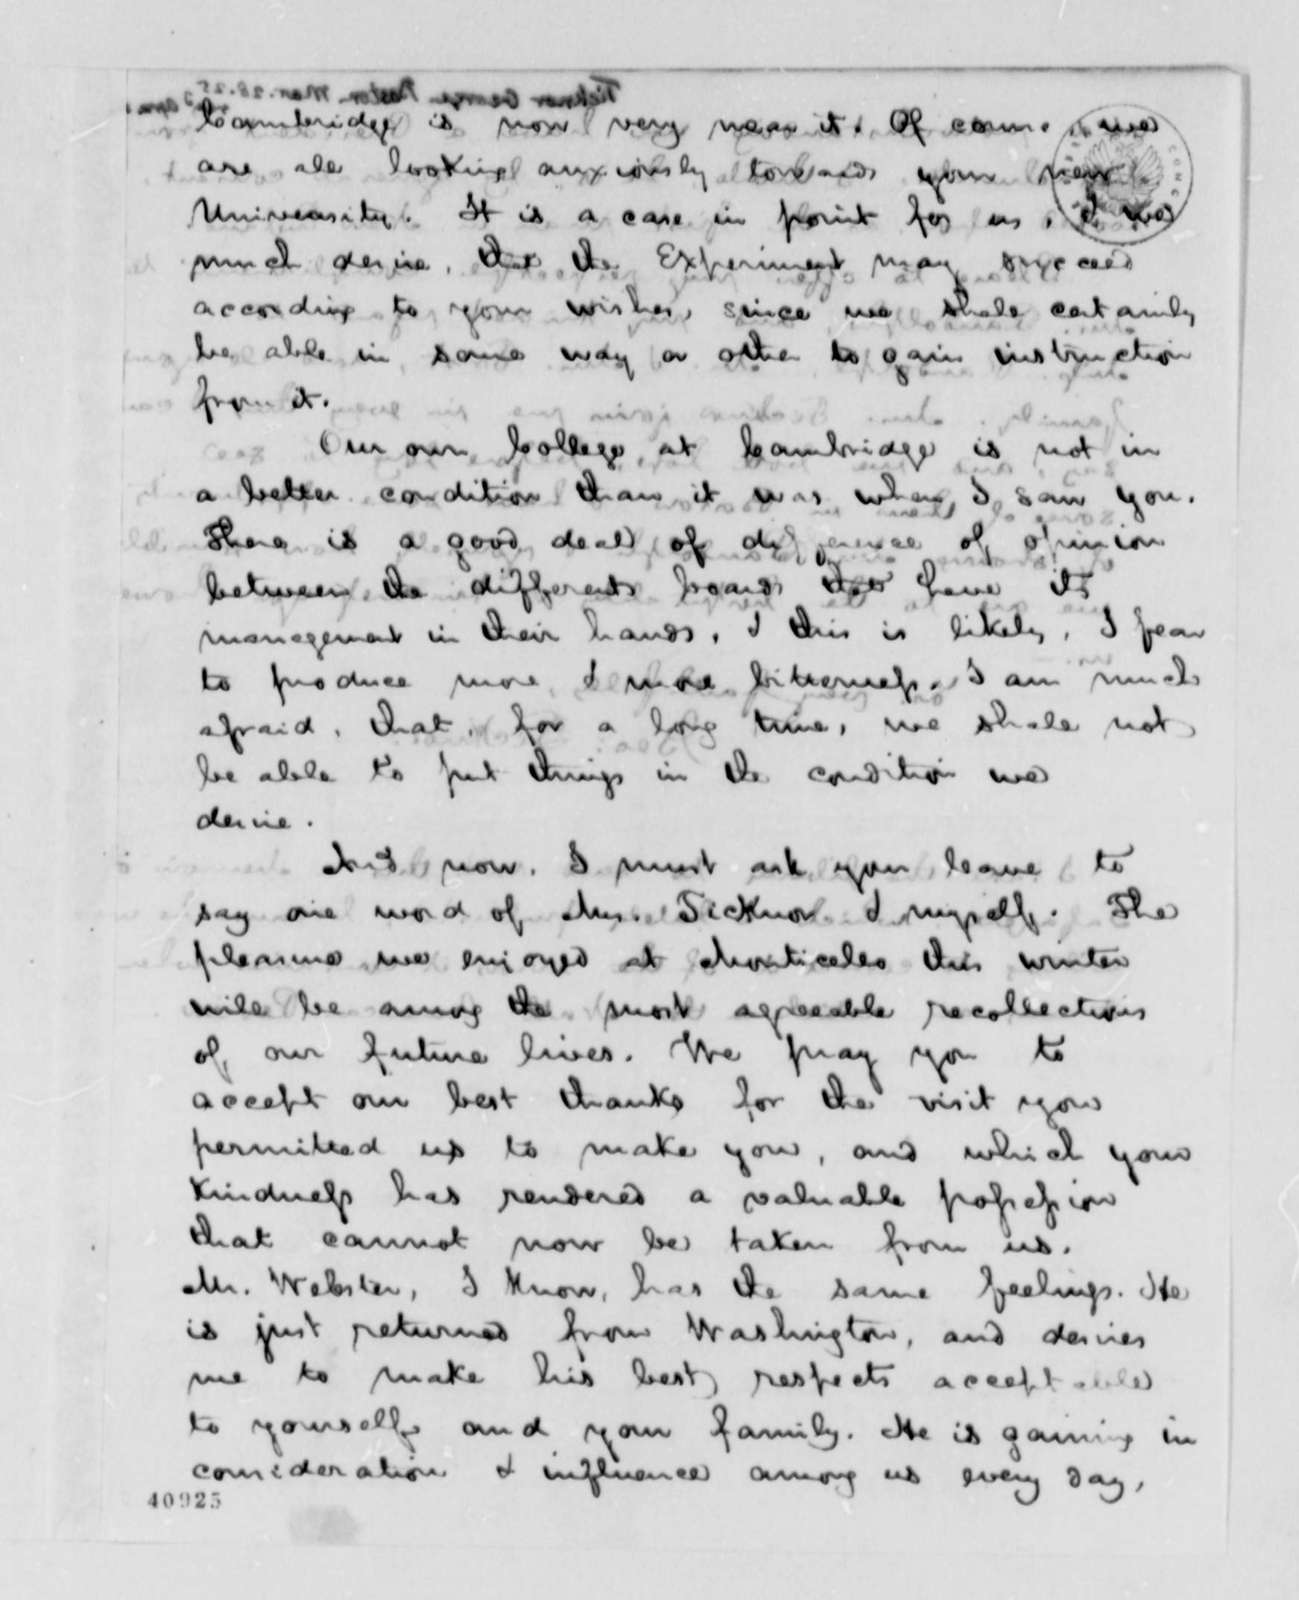 George Ticknor to Thomas Jefferson, March 28, 1825